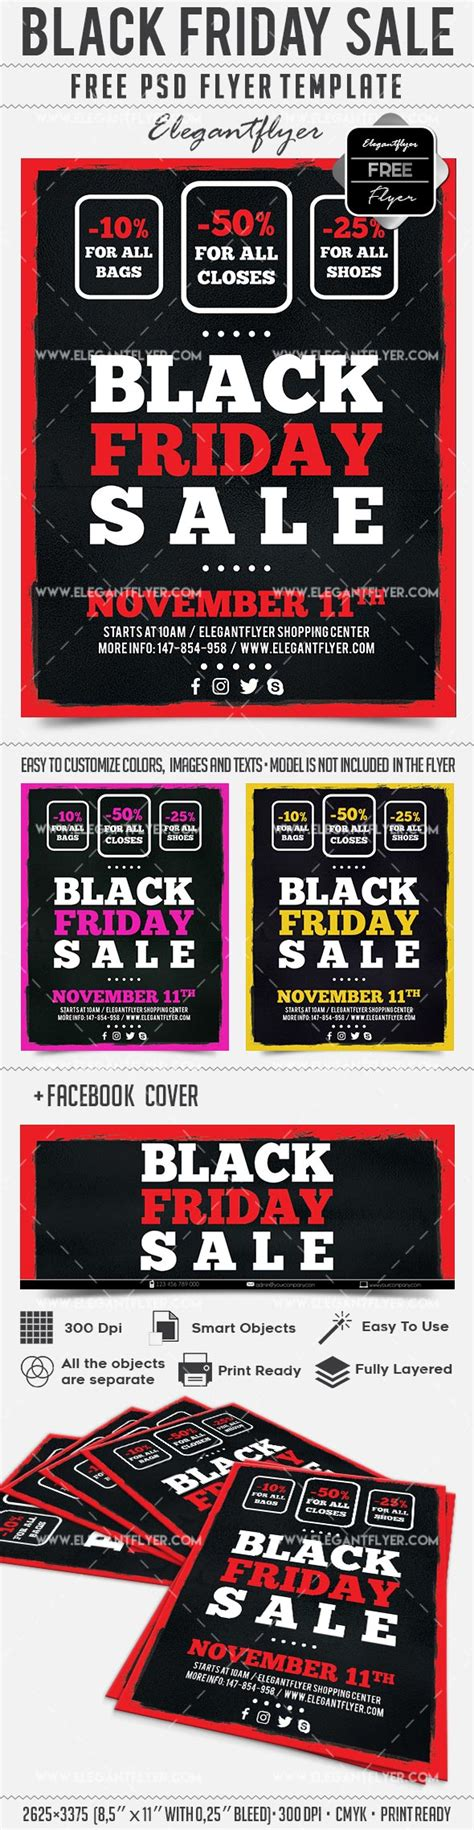 Free Black Friday Sale Facebook Cover Flyer Template Flyershitter Com Mailchimp Black Friday Template